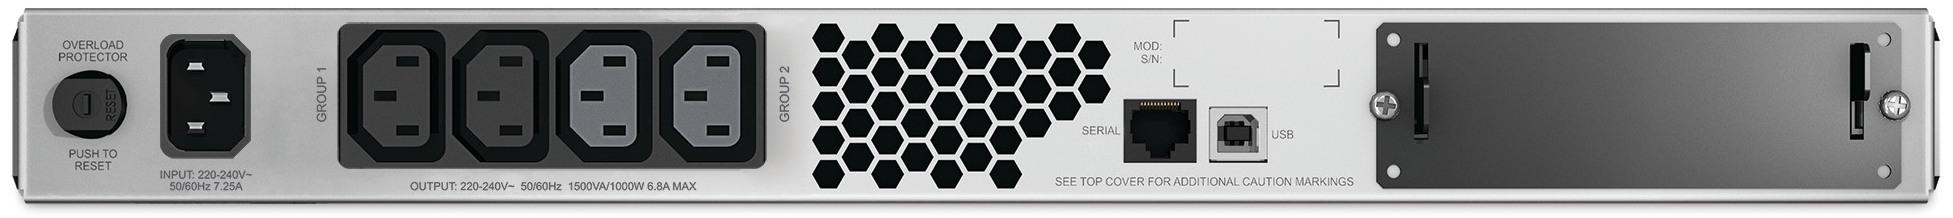 APC-by-Schneider-Electric-Smart-UPS-SMT1500RMI1U-Rear